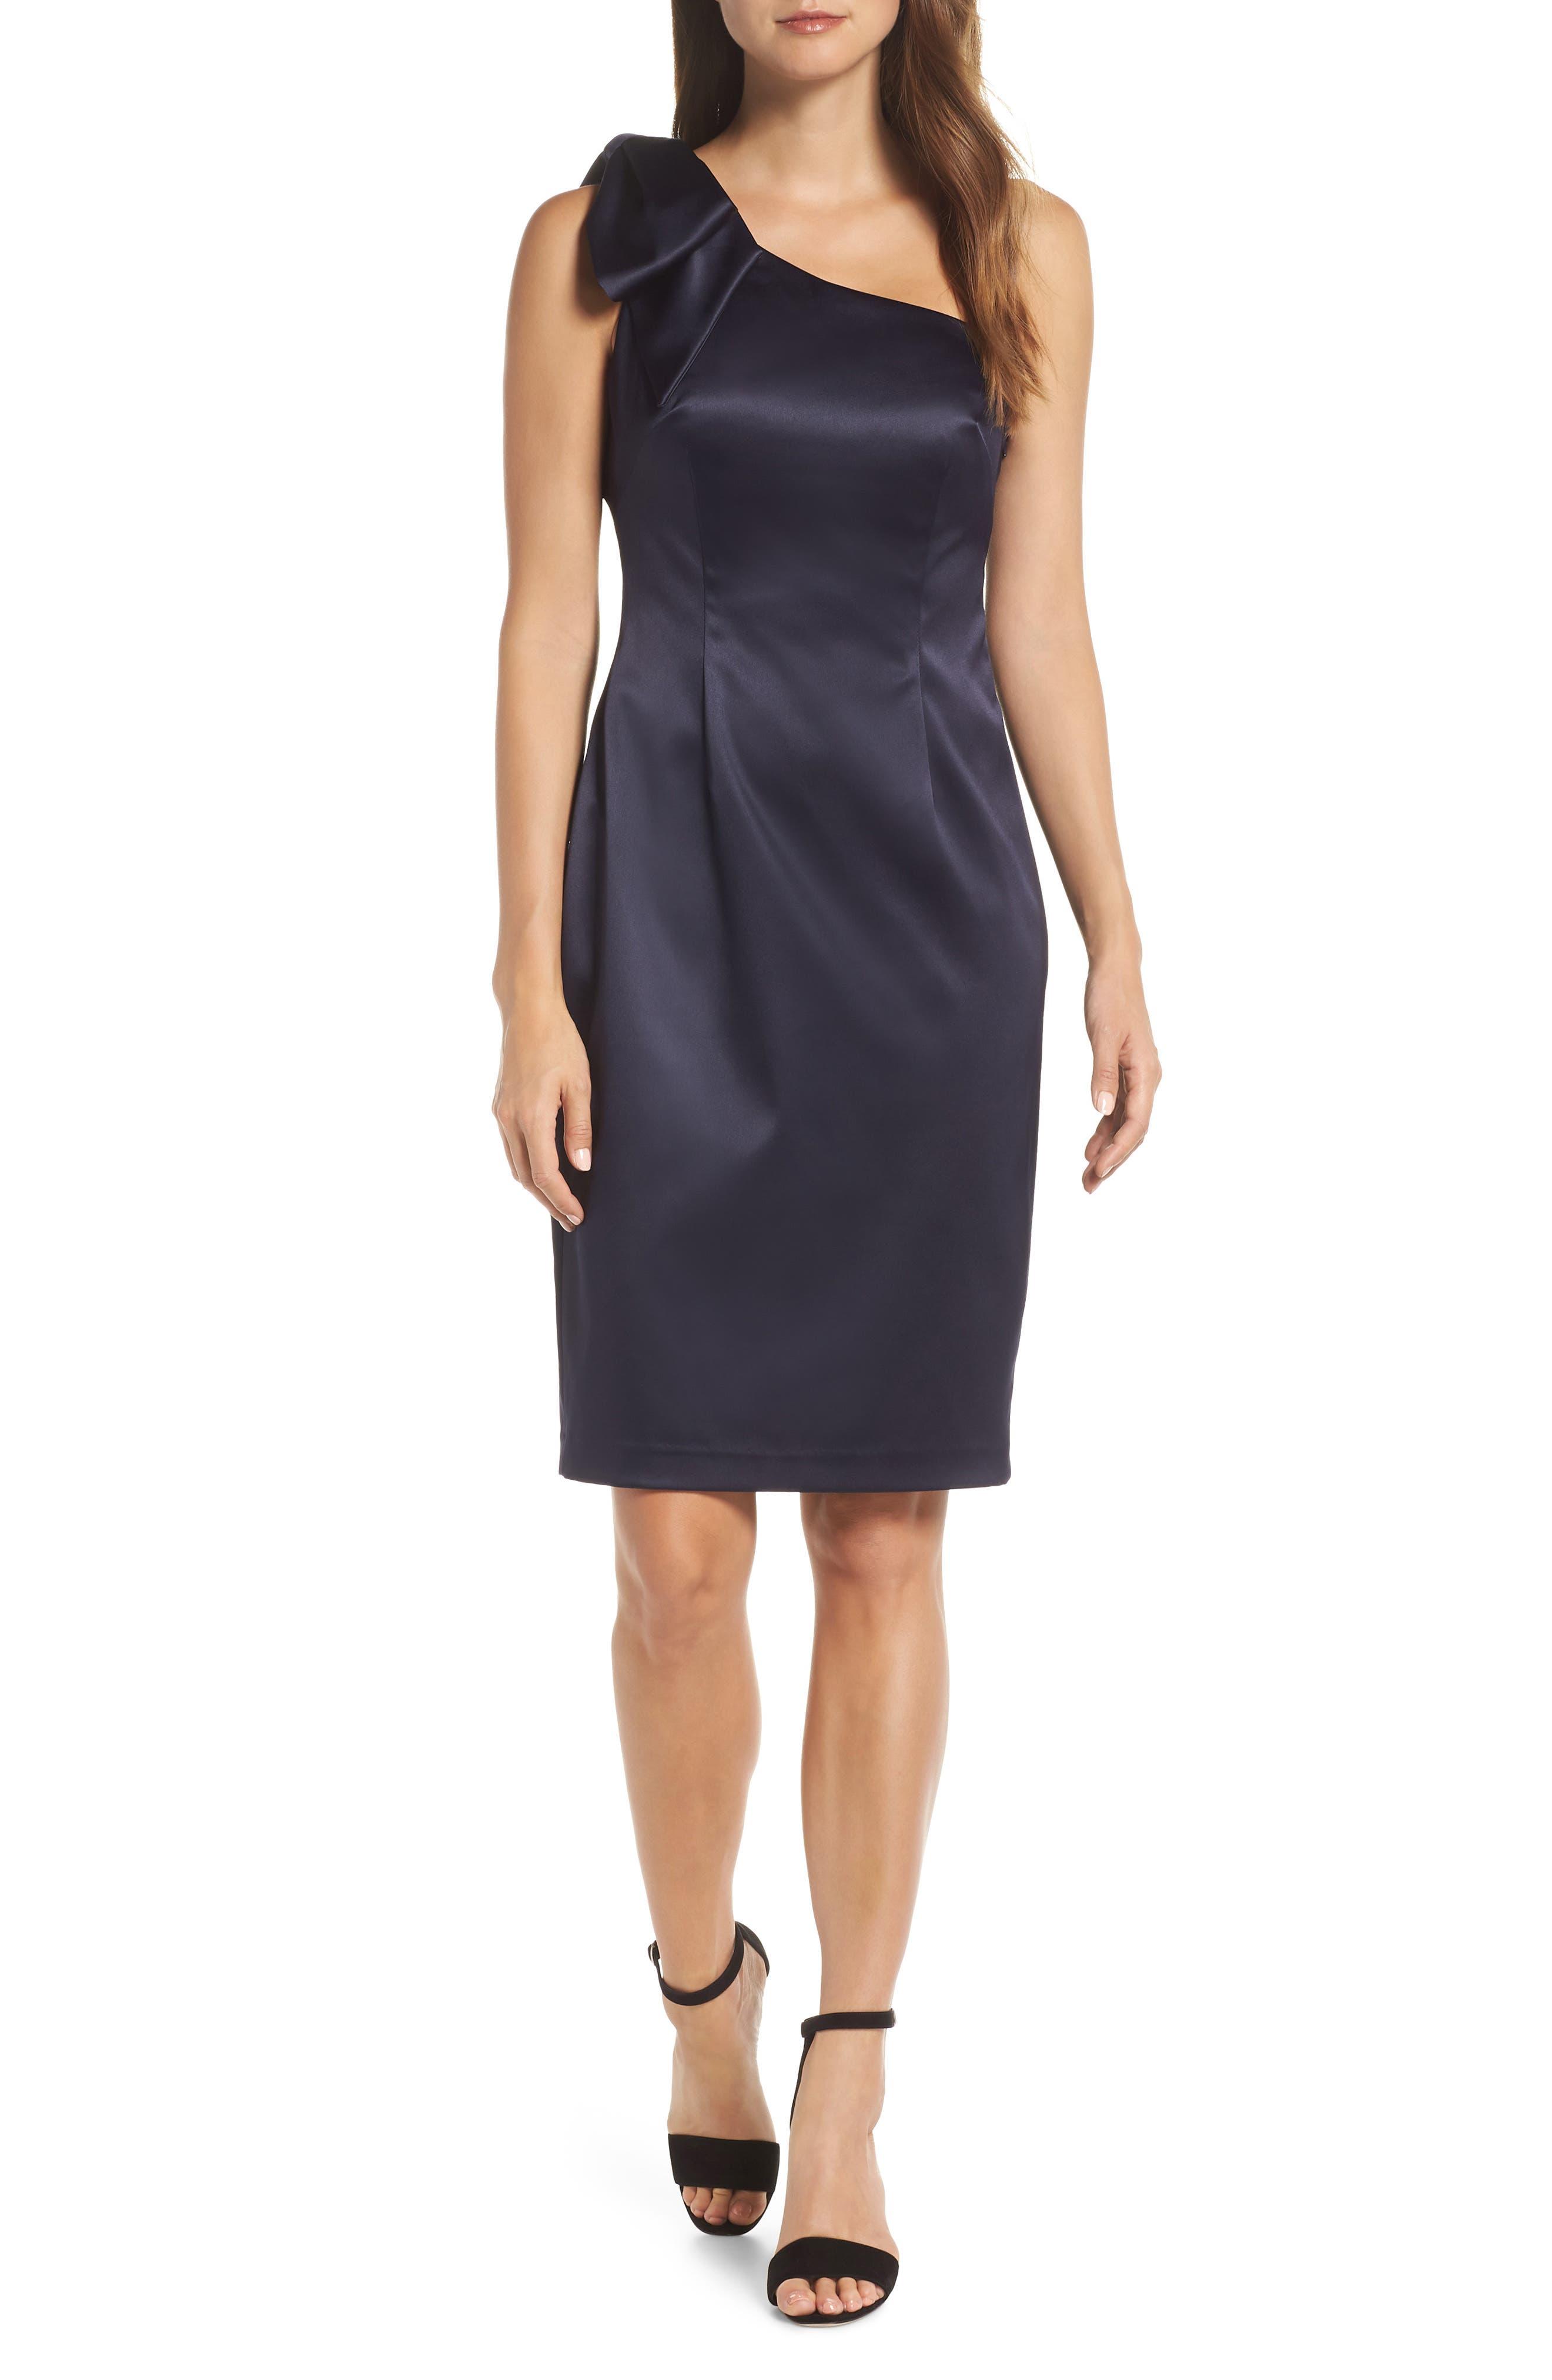 80s Dresses | Casual to Party Dresses Womens Eliza J One-Shoulder Bow Detail Satin Sheath Dress $138.00 AT vintagedancer.com